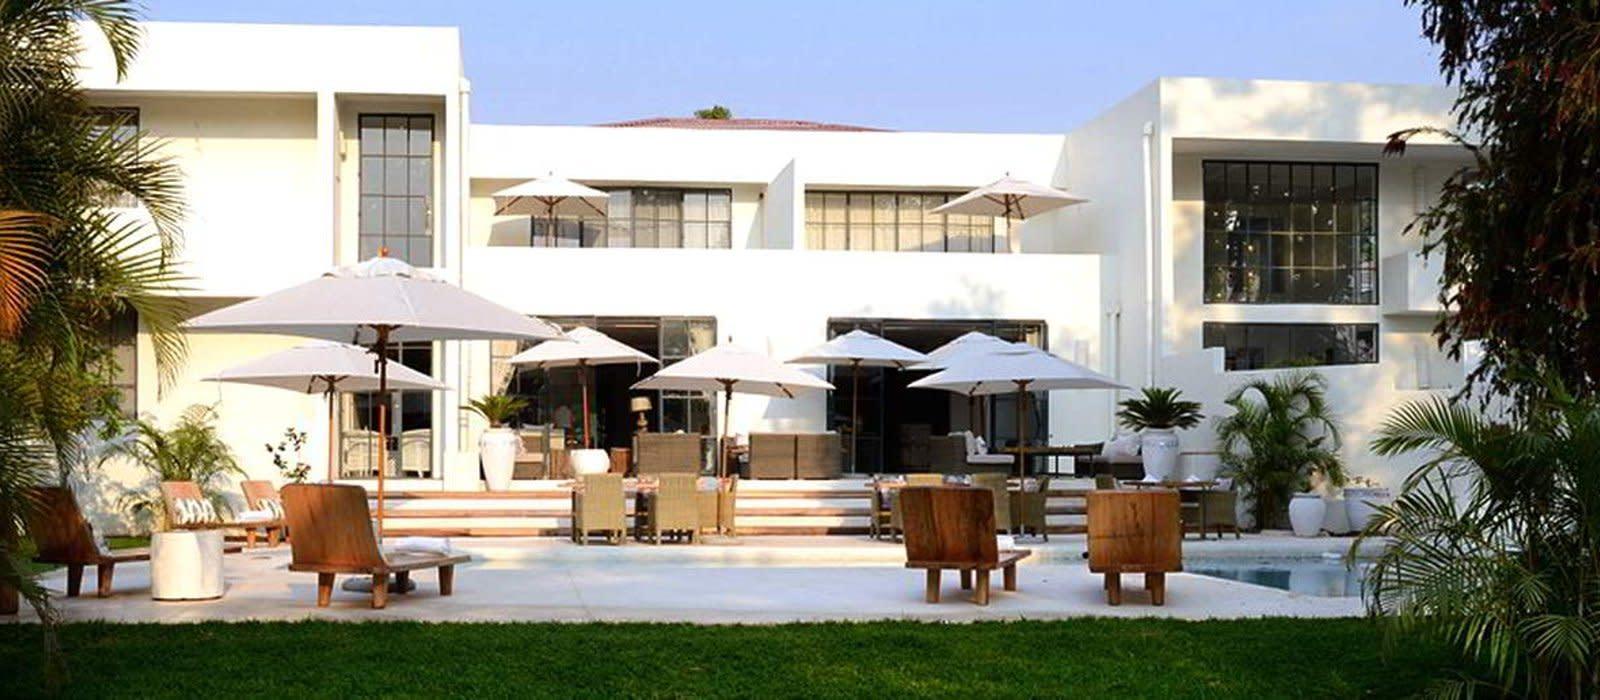 Hotel Latitude 15 Zambia